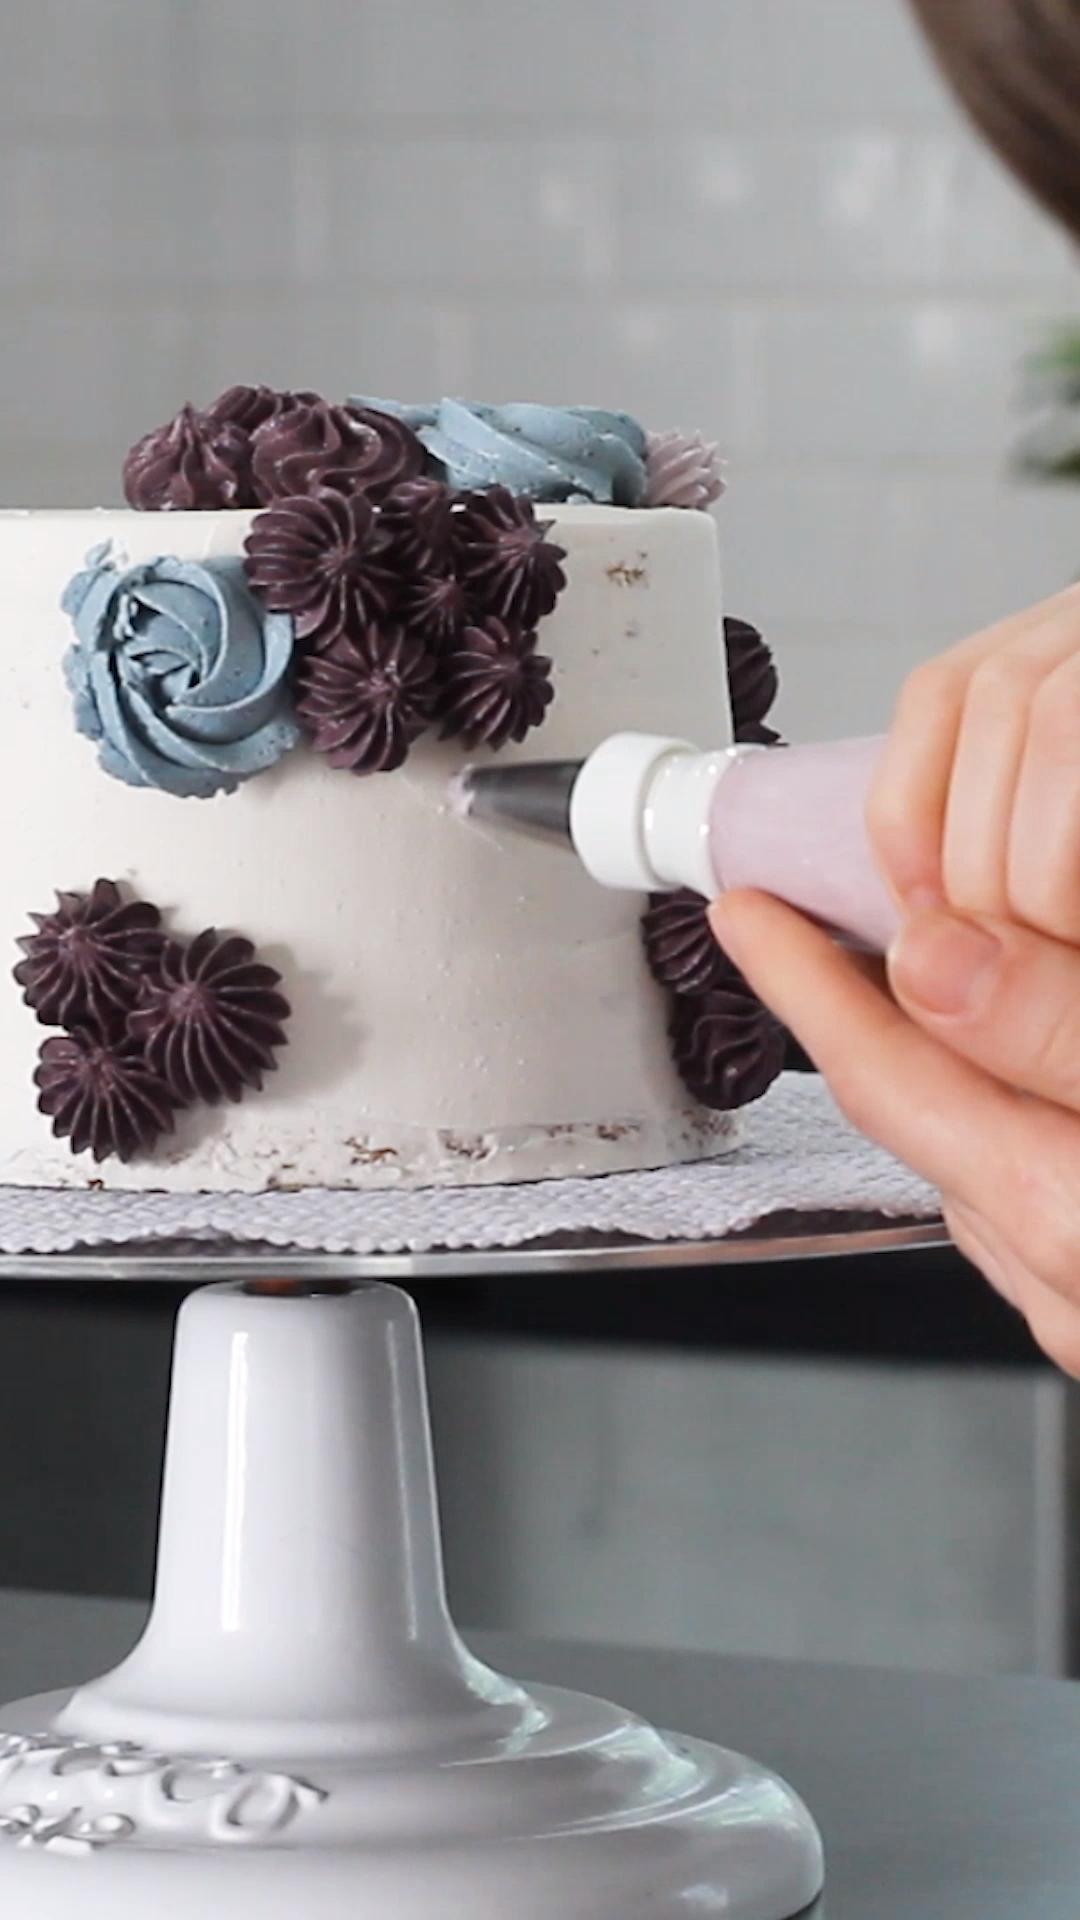 Star Tip Cake Decorating #cakedecoratingvideos